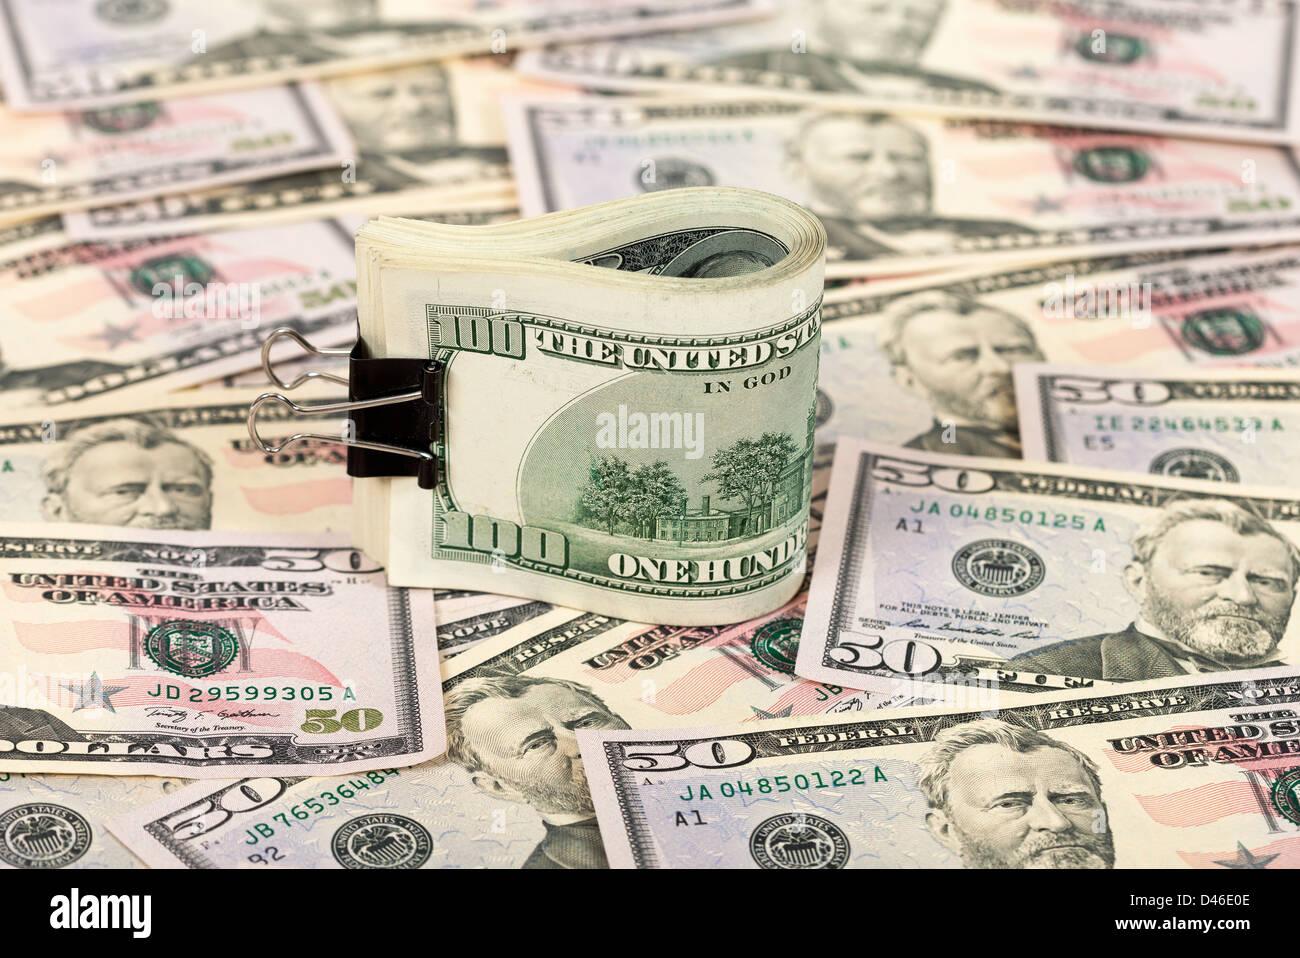 Folded hundred dollar bill on money background - Stock Image